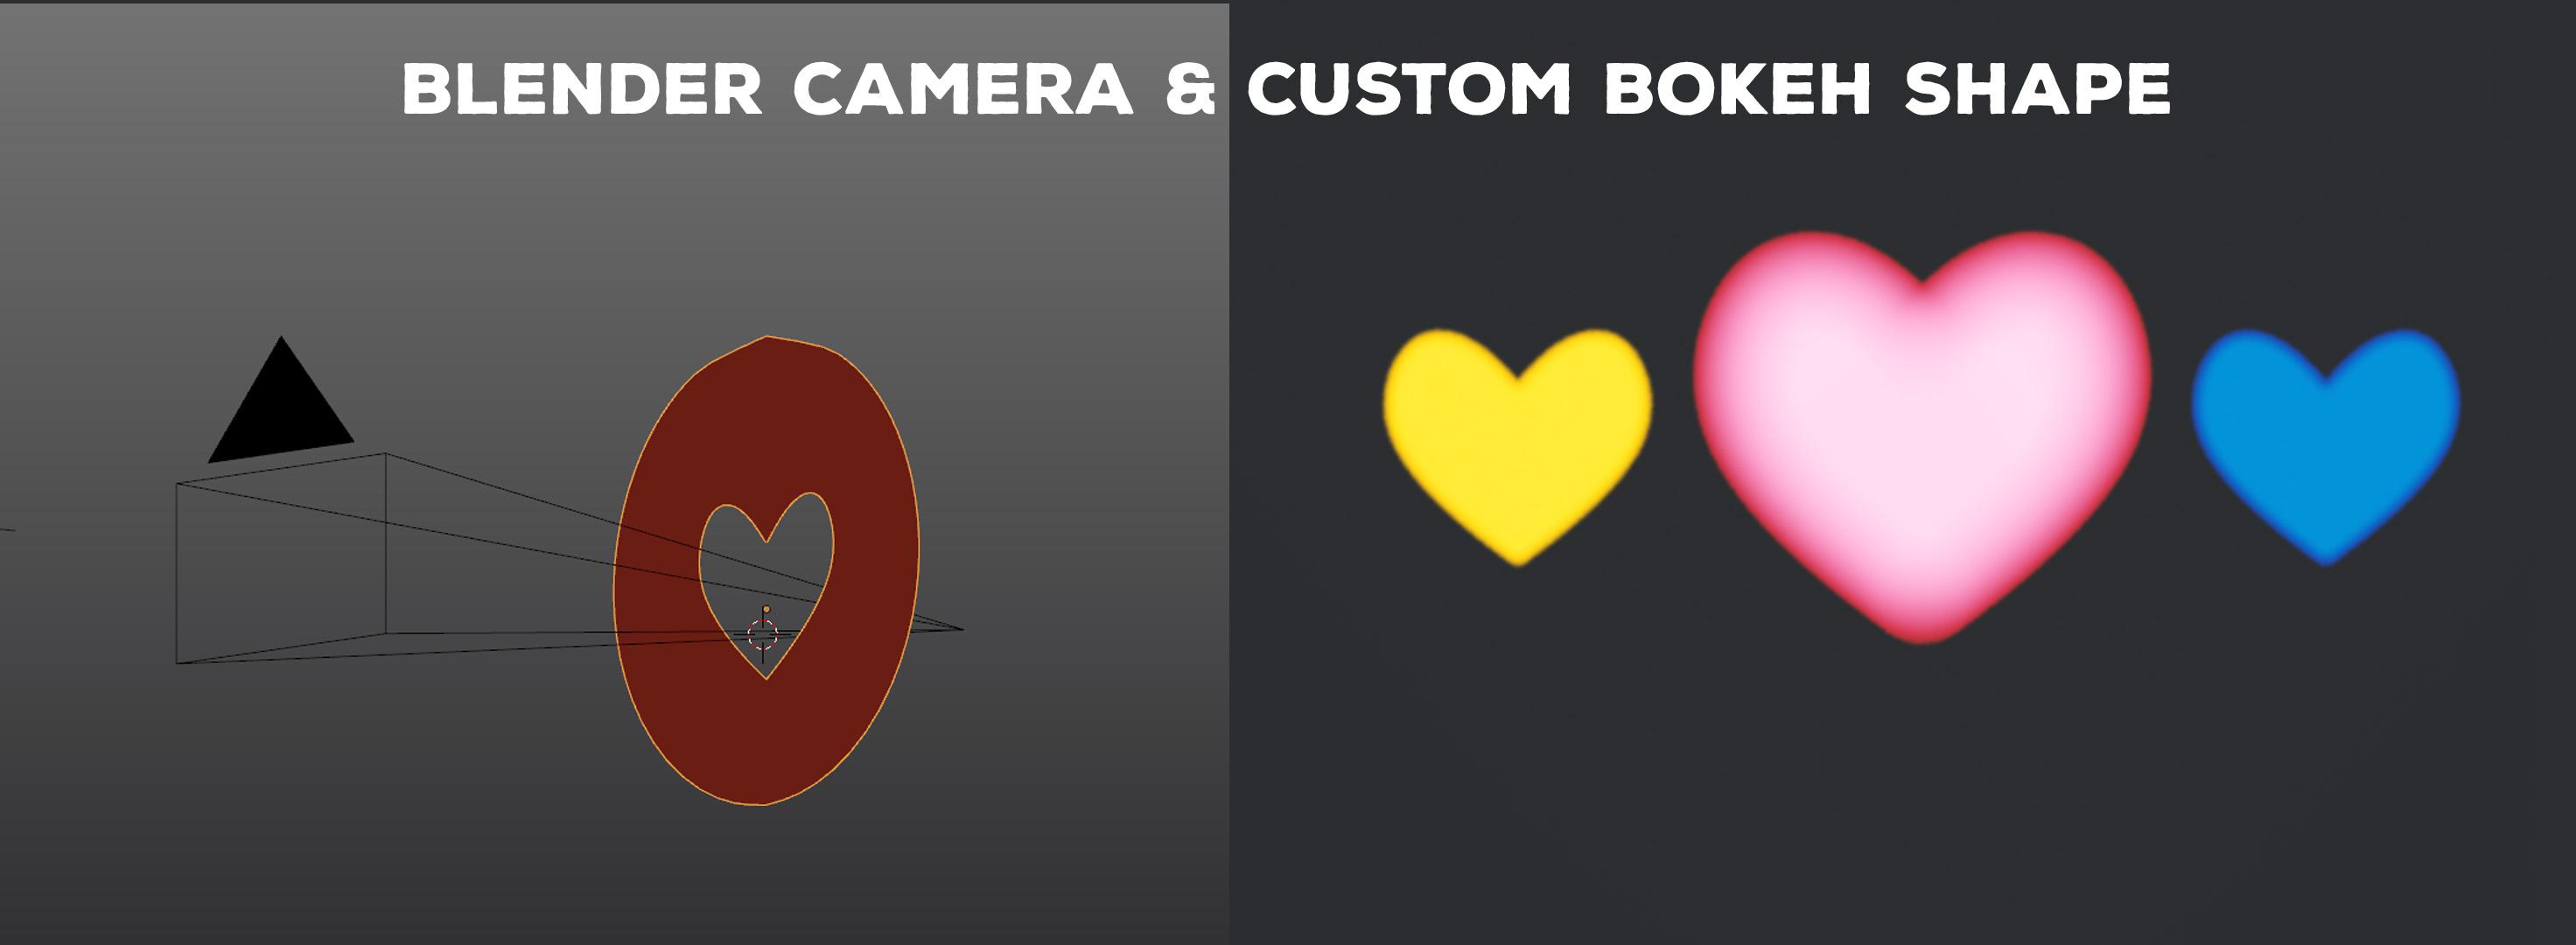 Reynante Martinez tip: Make custom bokeh shape by using stencil